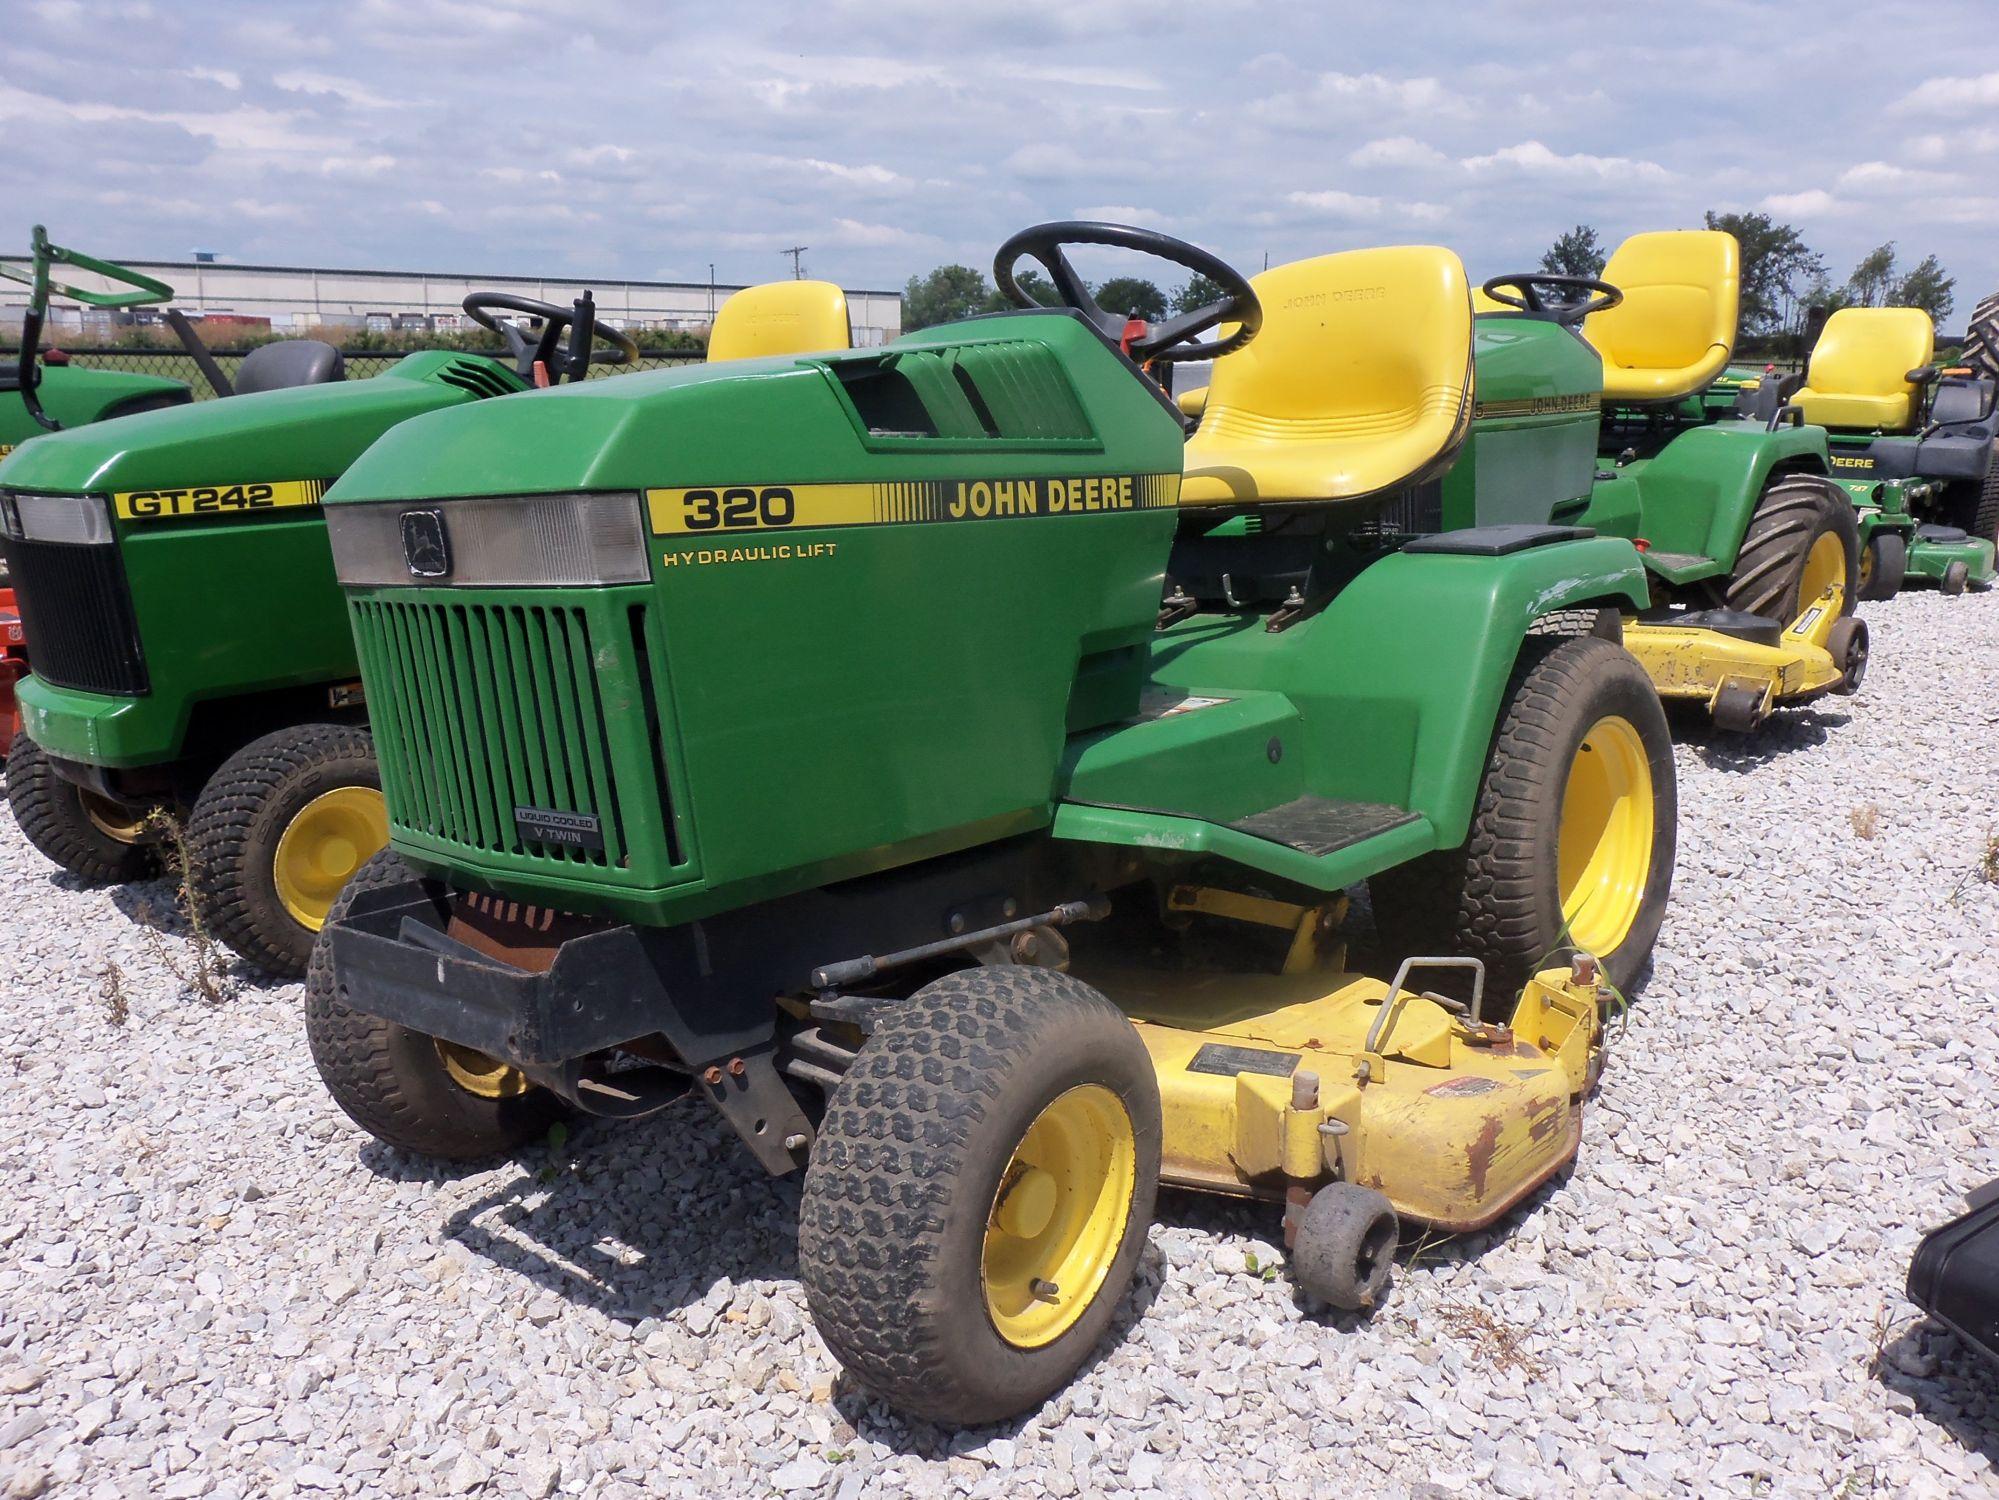 hight resolution of jd 4020 tractors jd 2520 tractors jd 2510 tractors on jd 4630 tractor